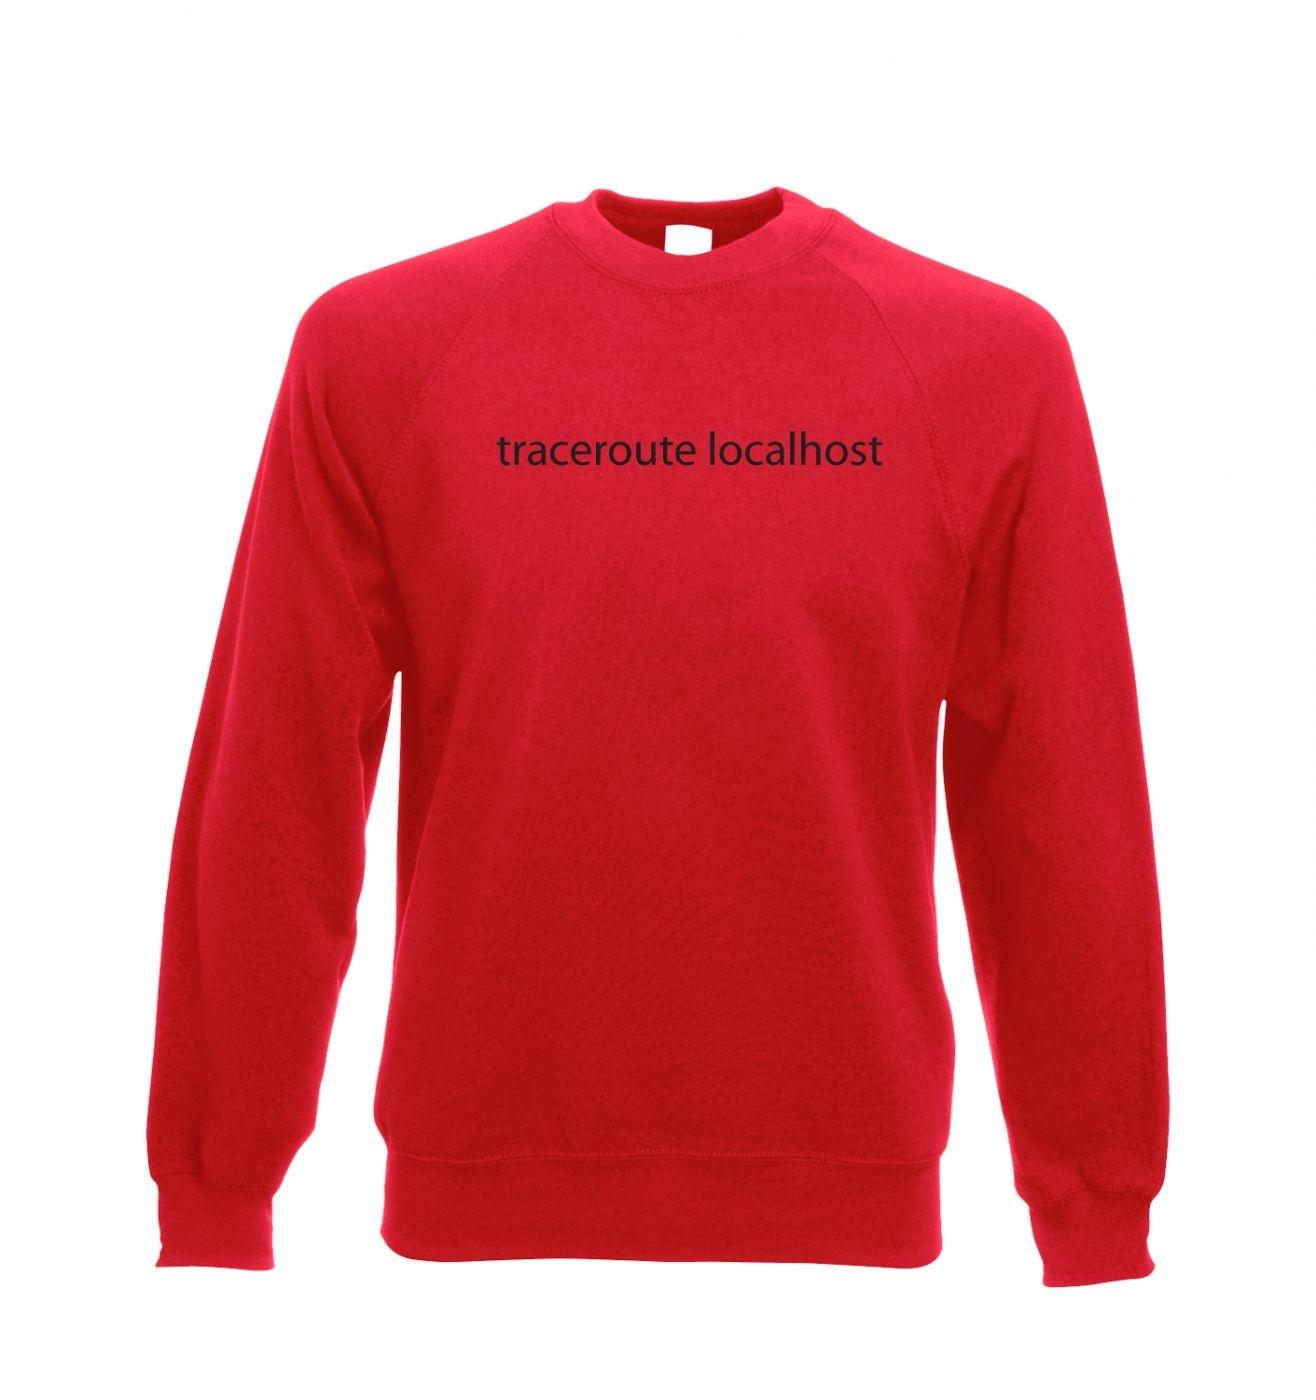 Traceroute localhost Adult Crewneck Sweatshirt